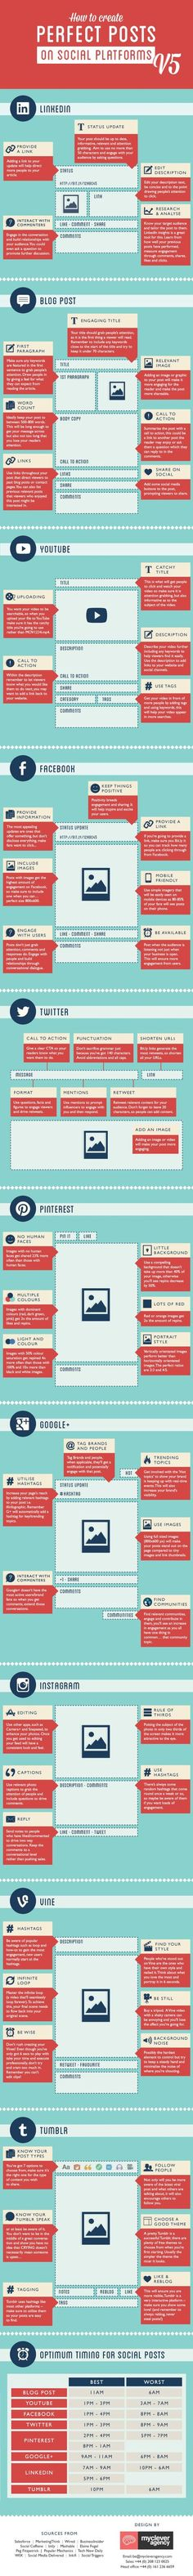 Social Media Posting Guide #SM #SMM #SocialMedia